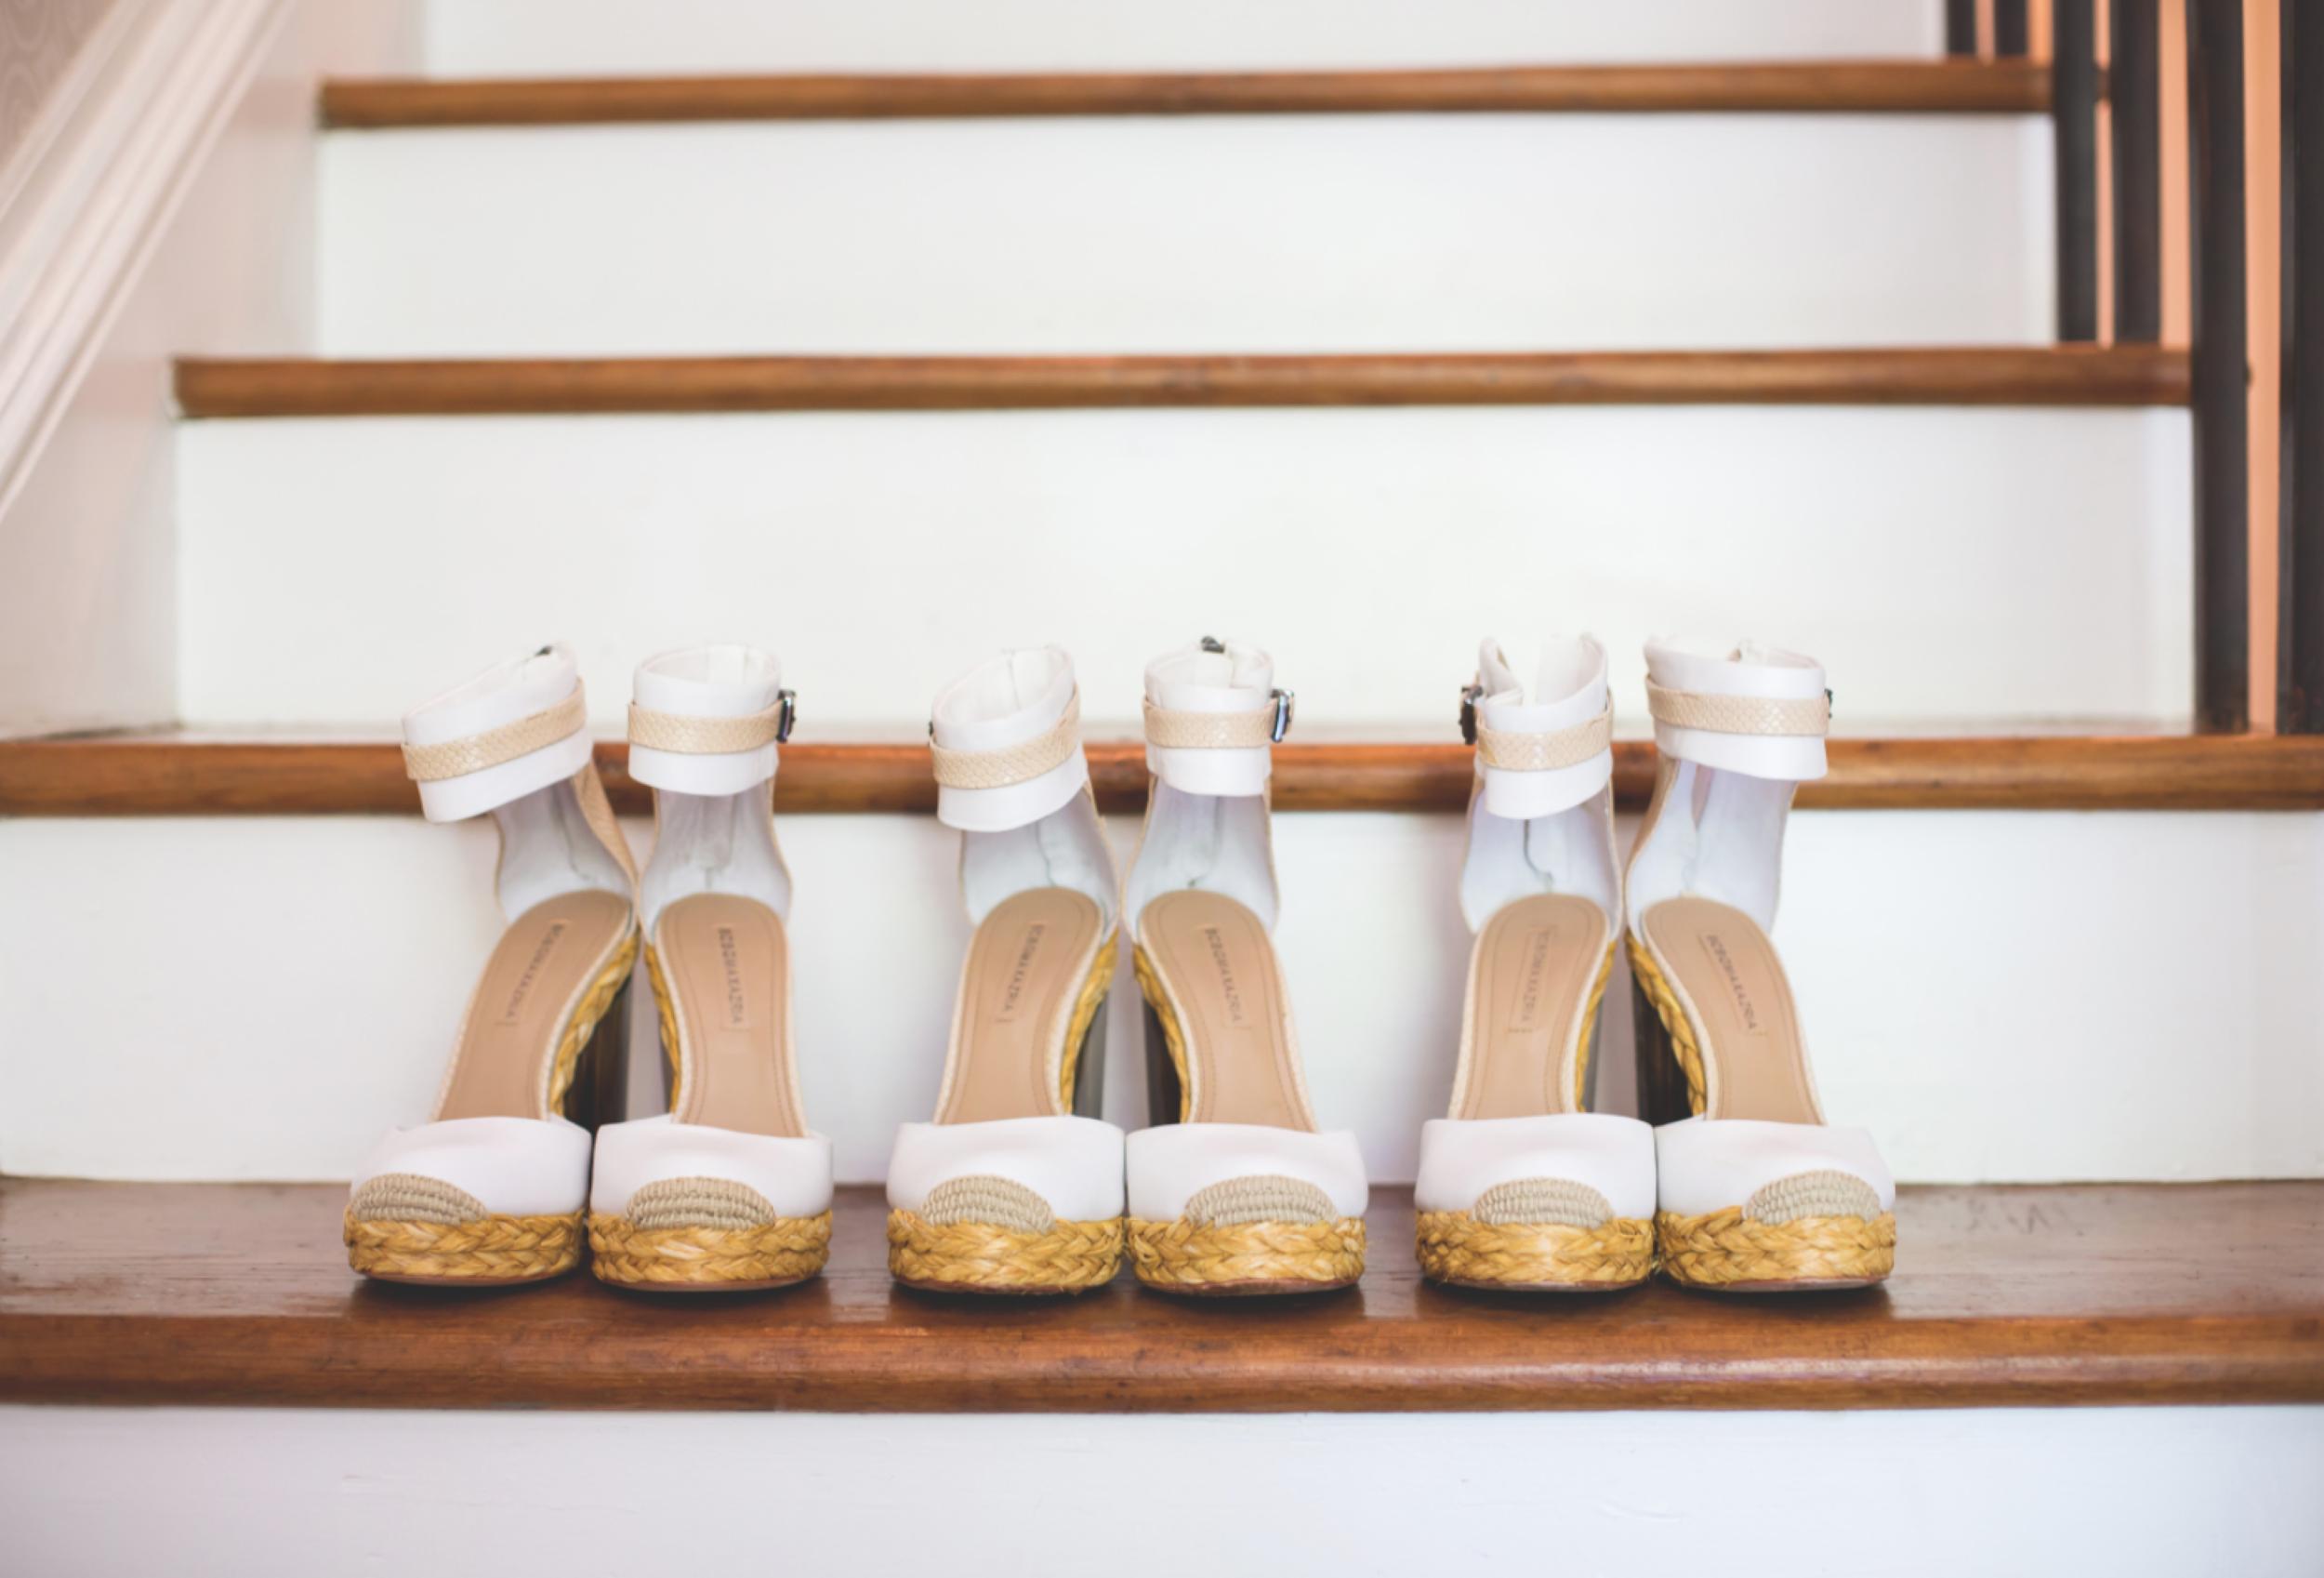 Wedding-Kurtz-Orchard-Market-Niagara-On-The-Lake-Toronto-Hamilton-Burlington-Oakville-Niagara-Wedding-Photographer-Photography-Moments-by-Lauren-Photo-Image-6.png